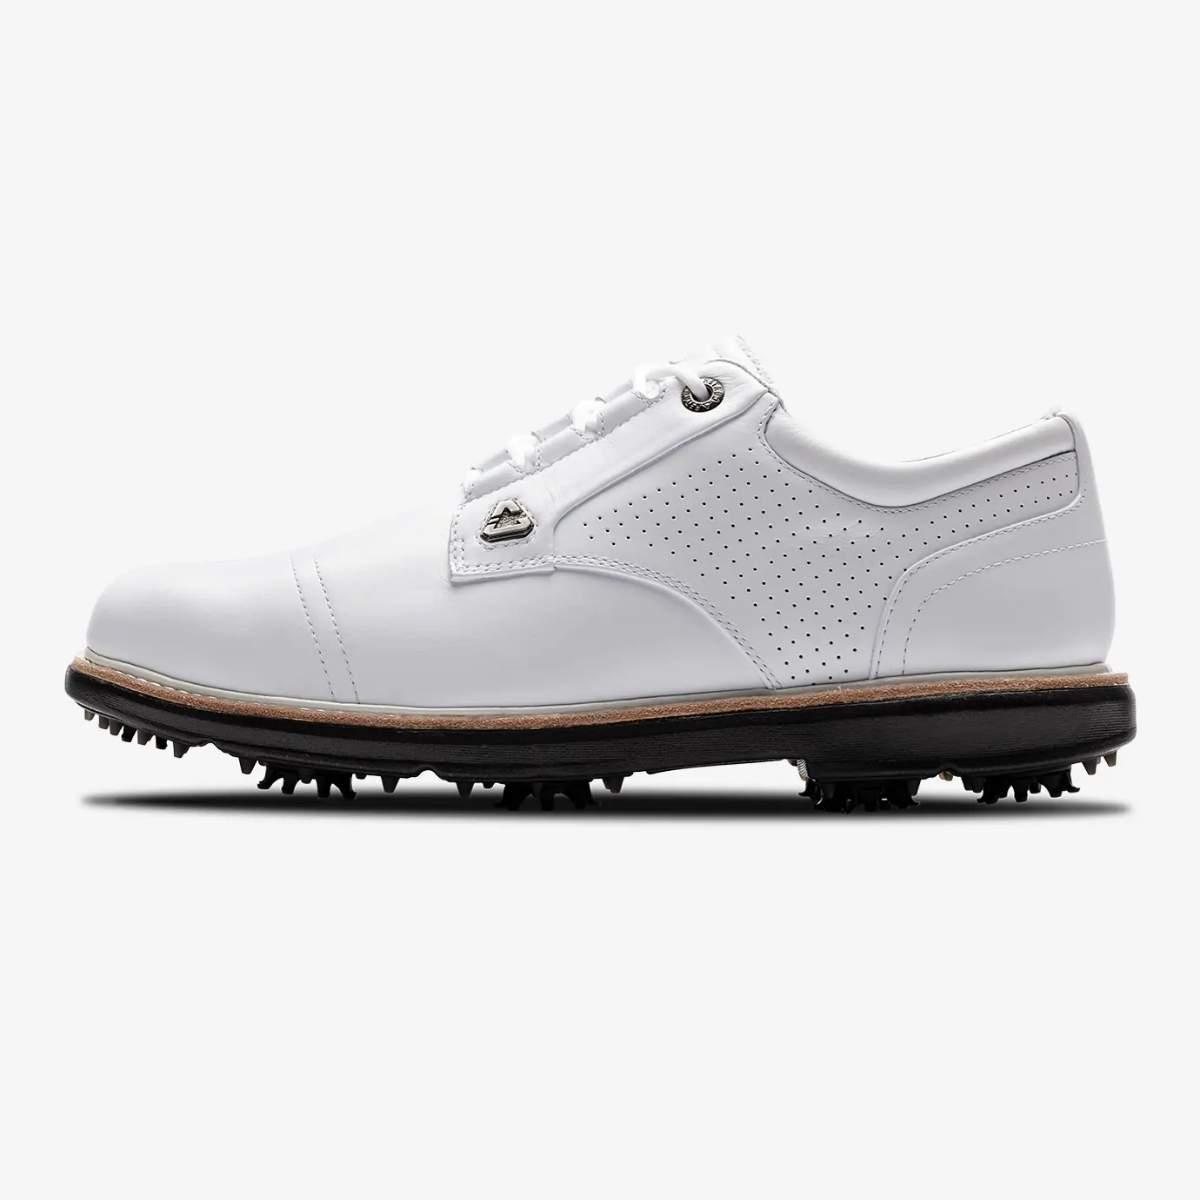 TravisMathew Cuater The Legend White Golf Shoe